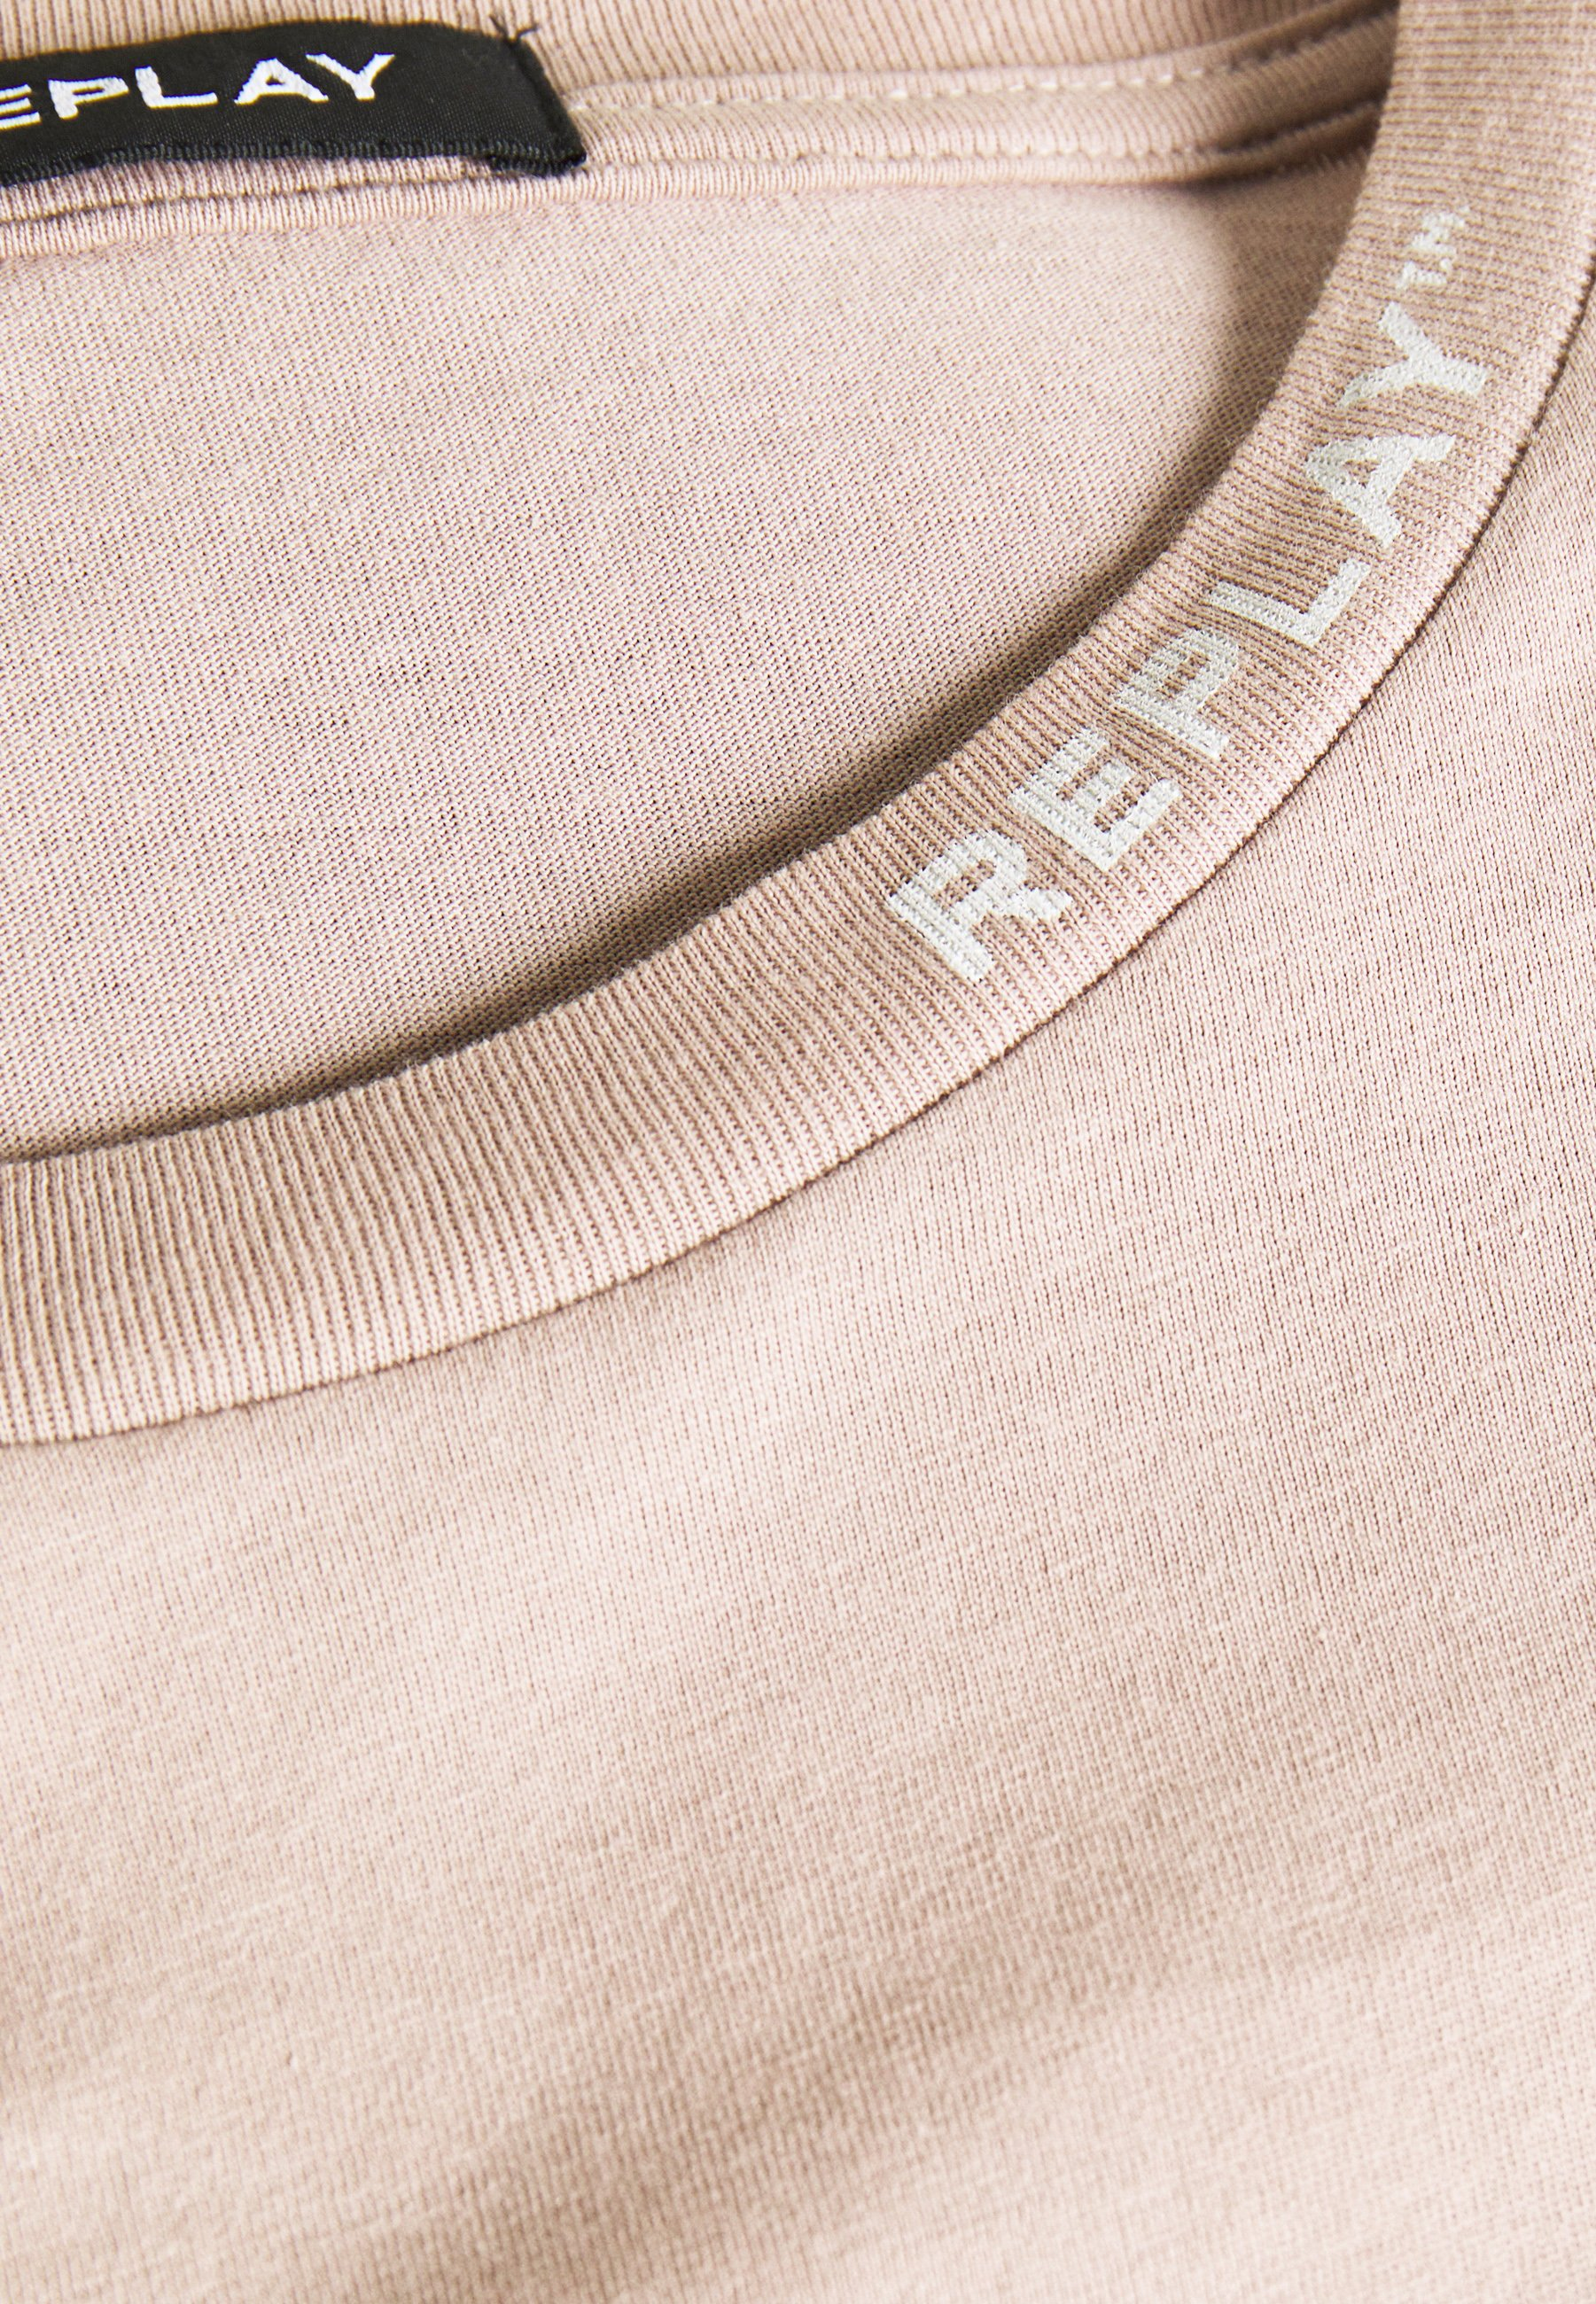 Replay Basic T-shirt - beige EATXH